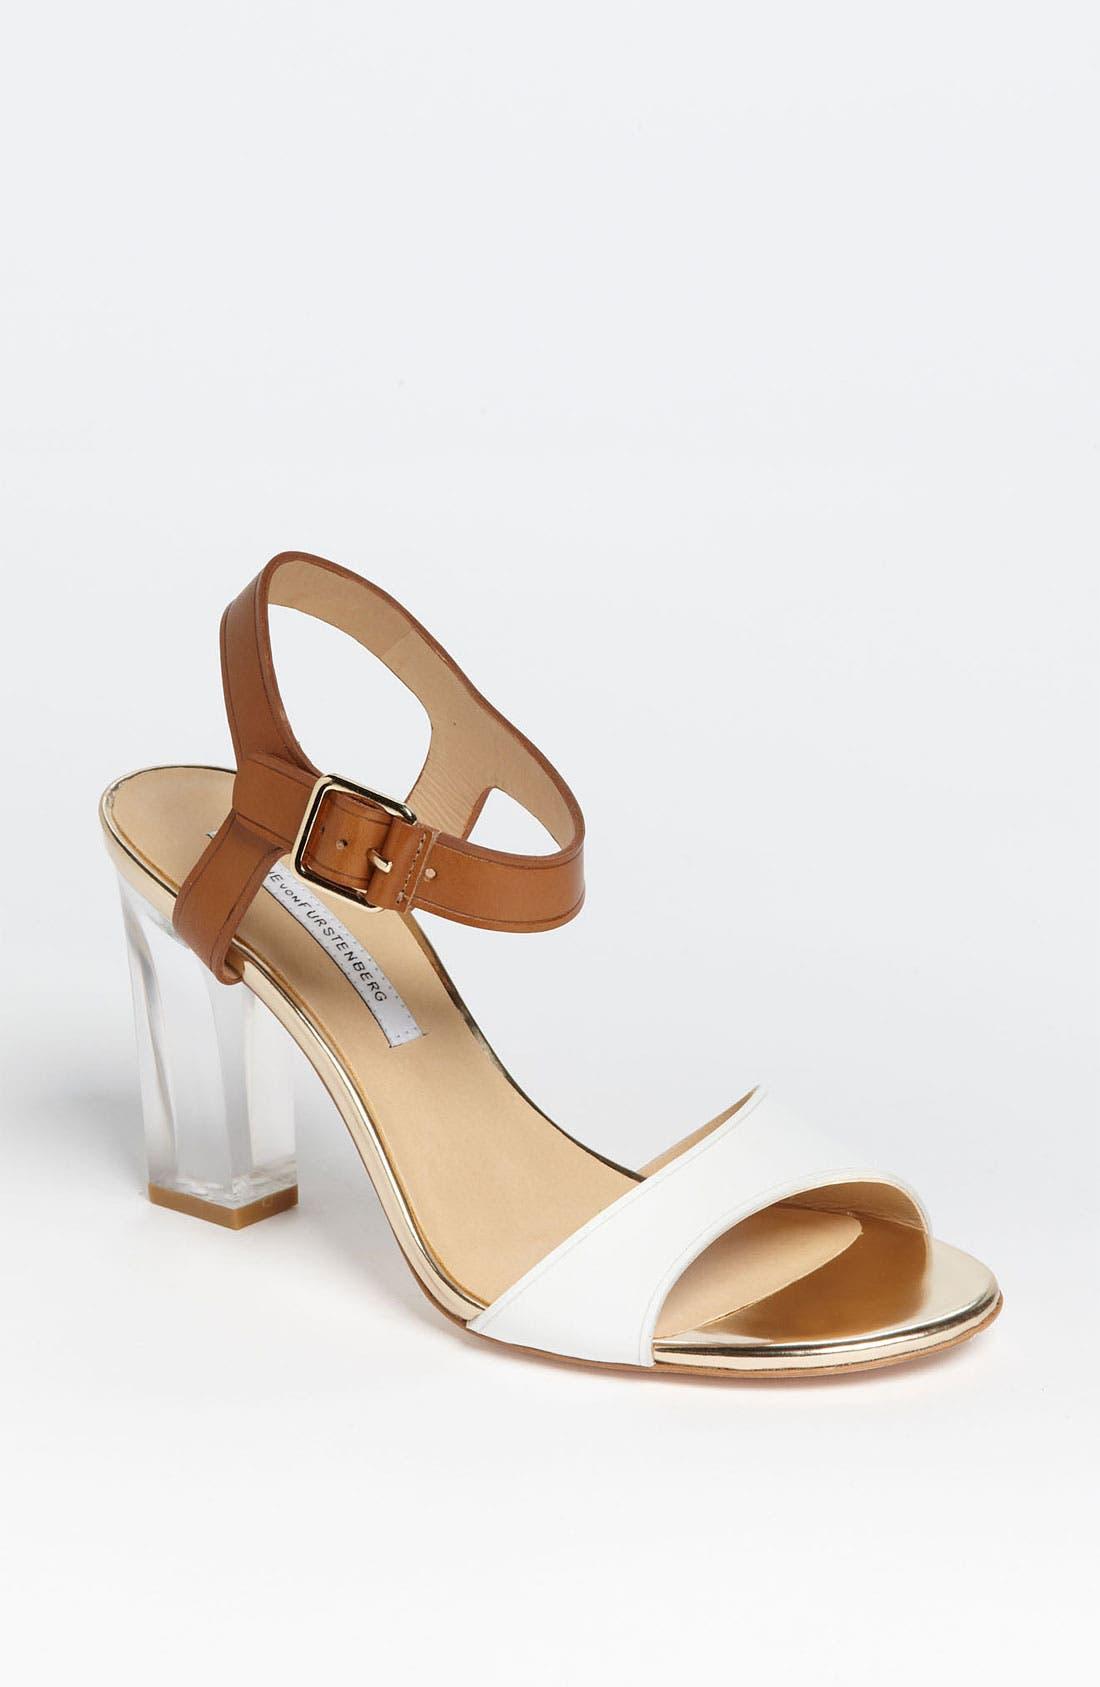 Main Image - Diane von Furstenberg 'Patmos' Sandal (Online Only)